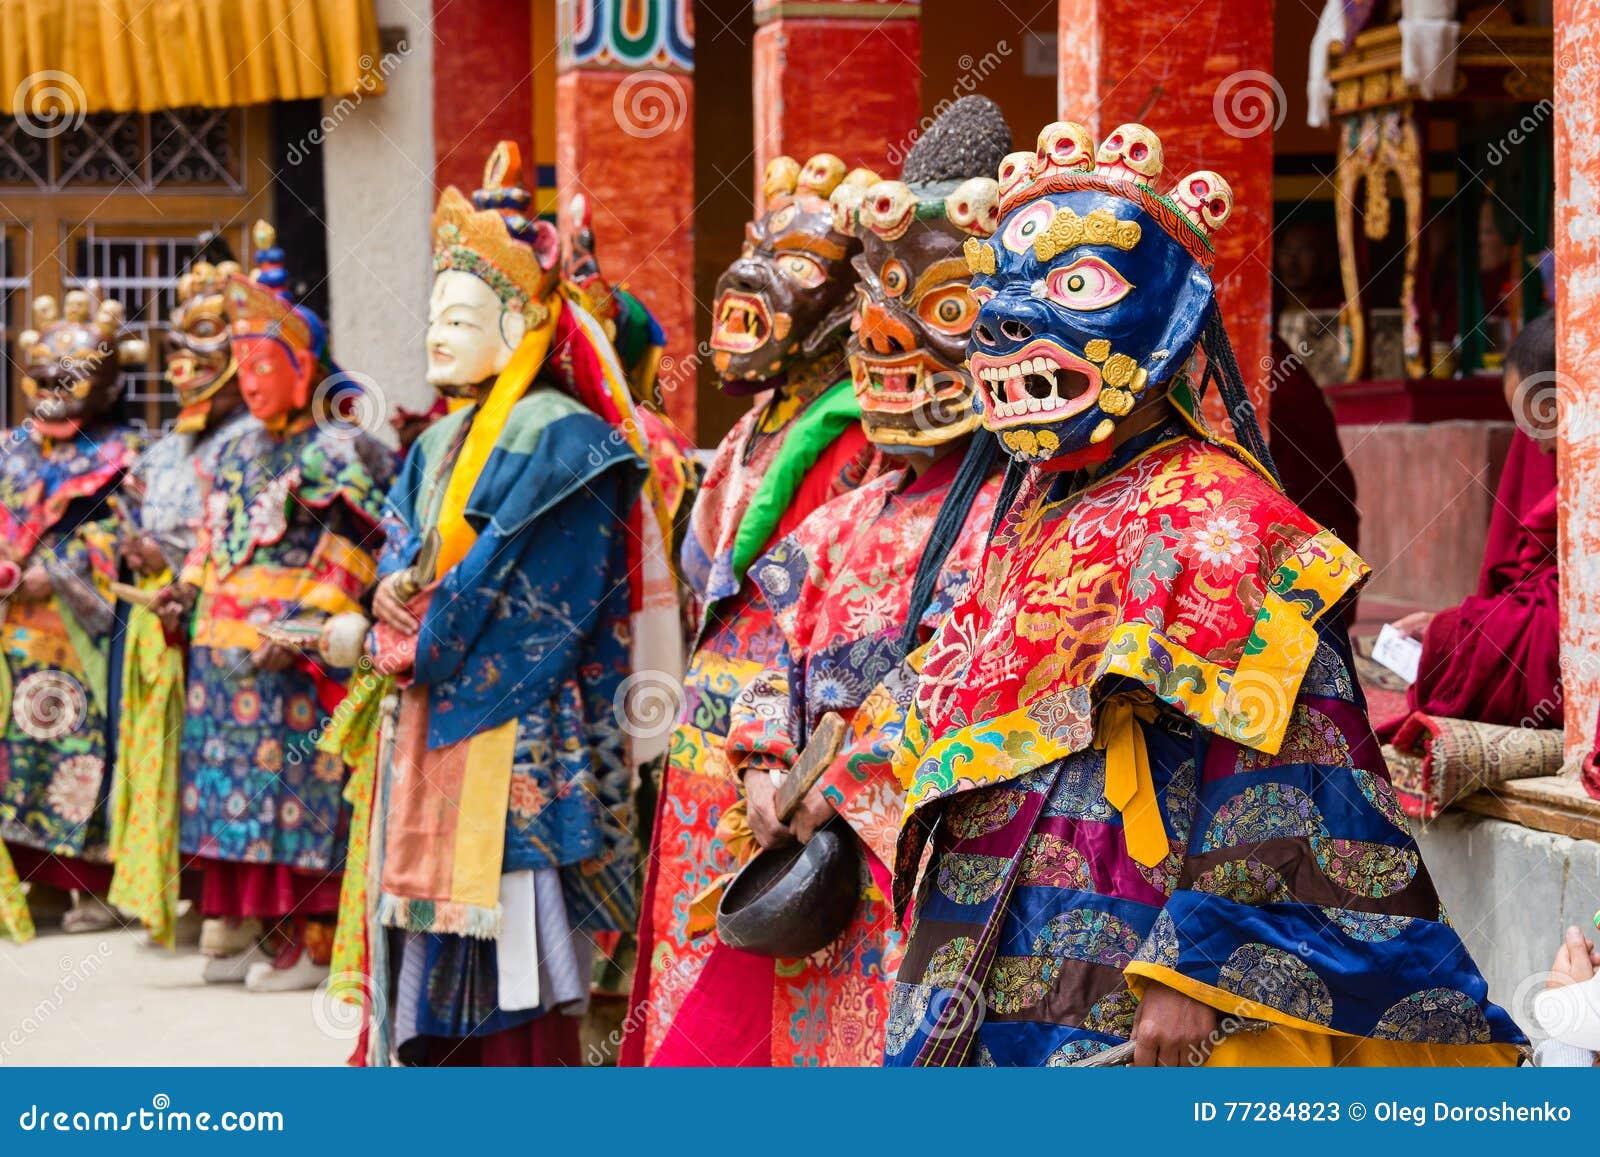 333750f40 LAMAYURU, INDIA - JUNE 13, 2015: Unidentified buddhist lamas dressed in  mystical mask dancing Tsam mystery dance in time of Yuru Kabgyat Buddhist  festival ...